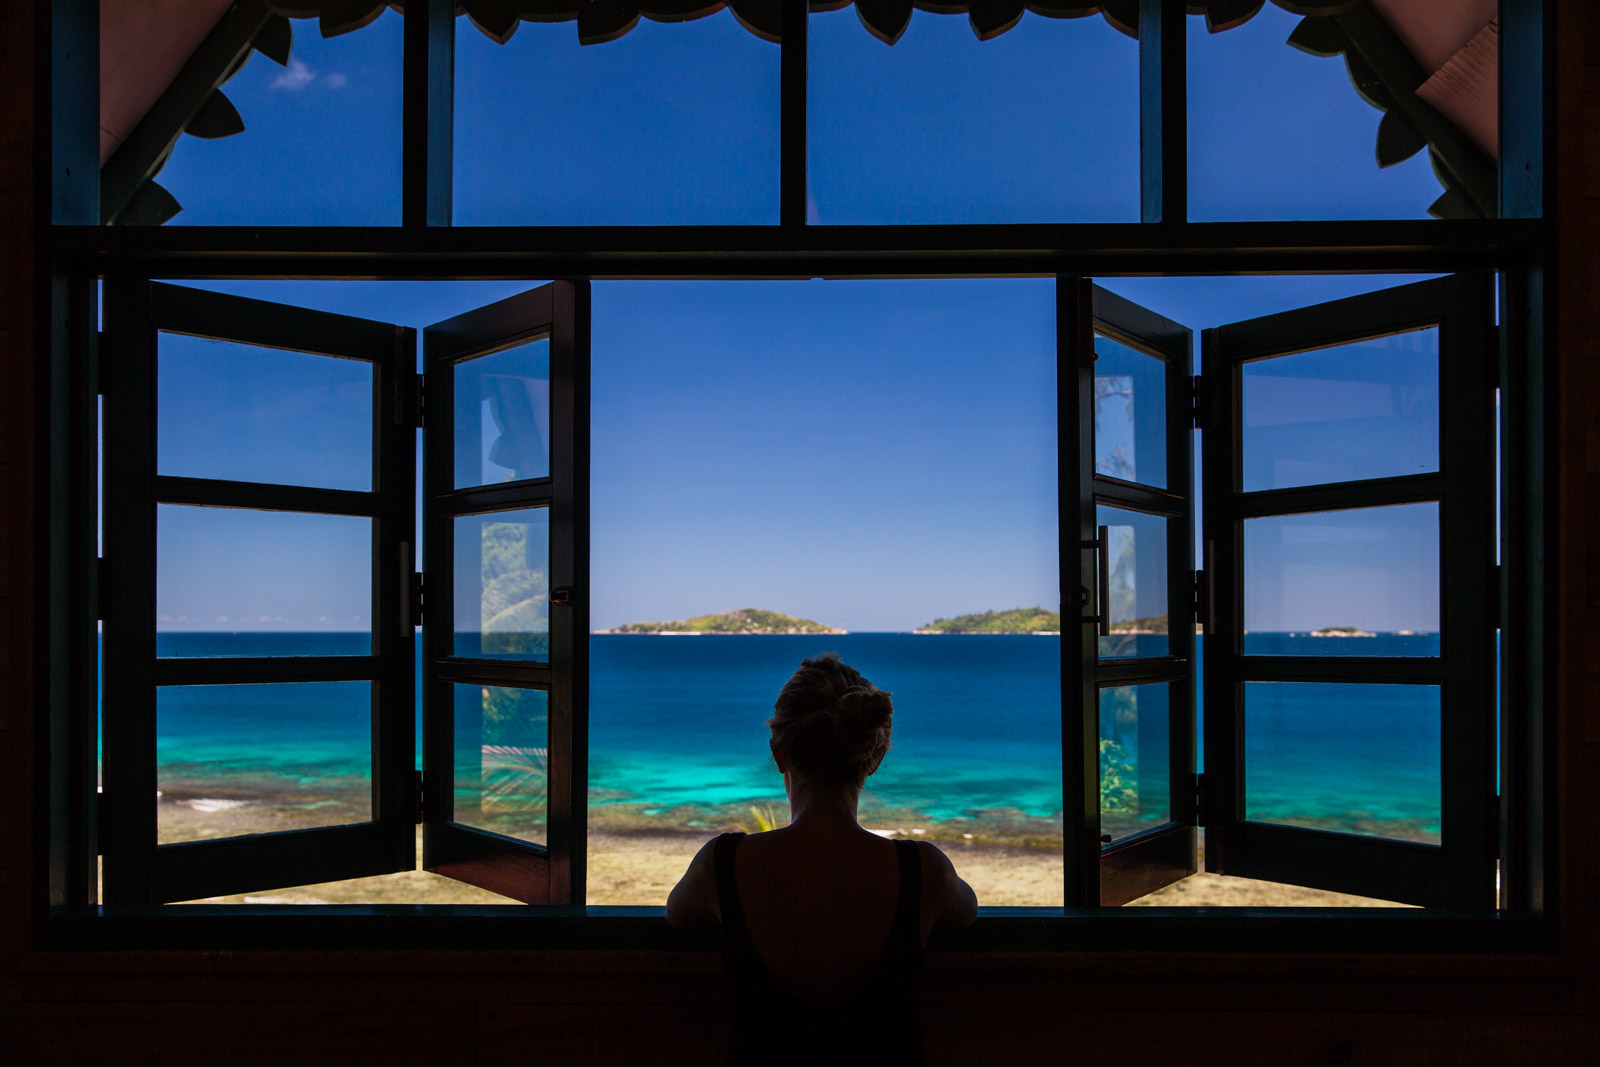 beach, chillax, destination photographer, destinationsfotograf, fotograf, la digue, palm tree, paradise, photographer, reading, relax, resefotograf, seychellerna, seychelles, travel, travel photographer, vacation, vacation home, house rental